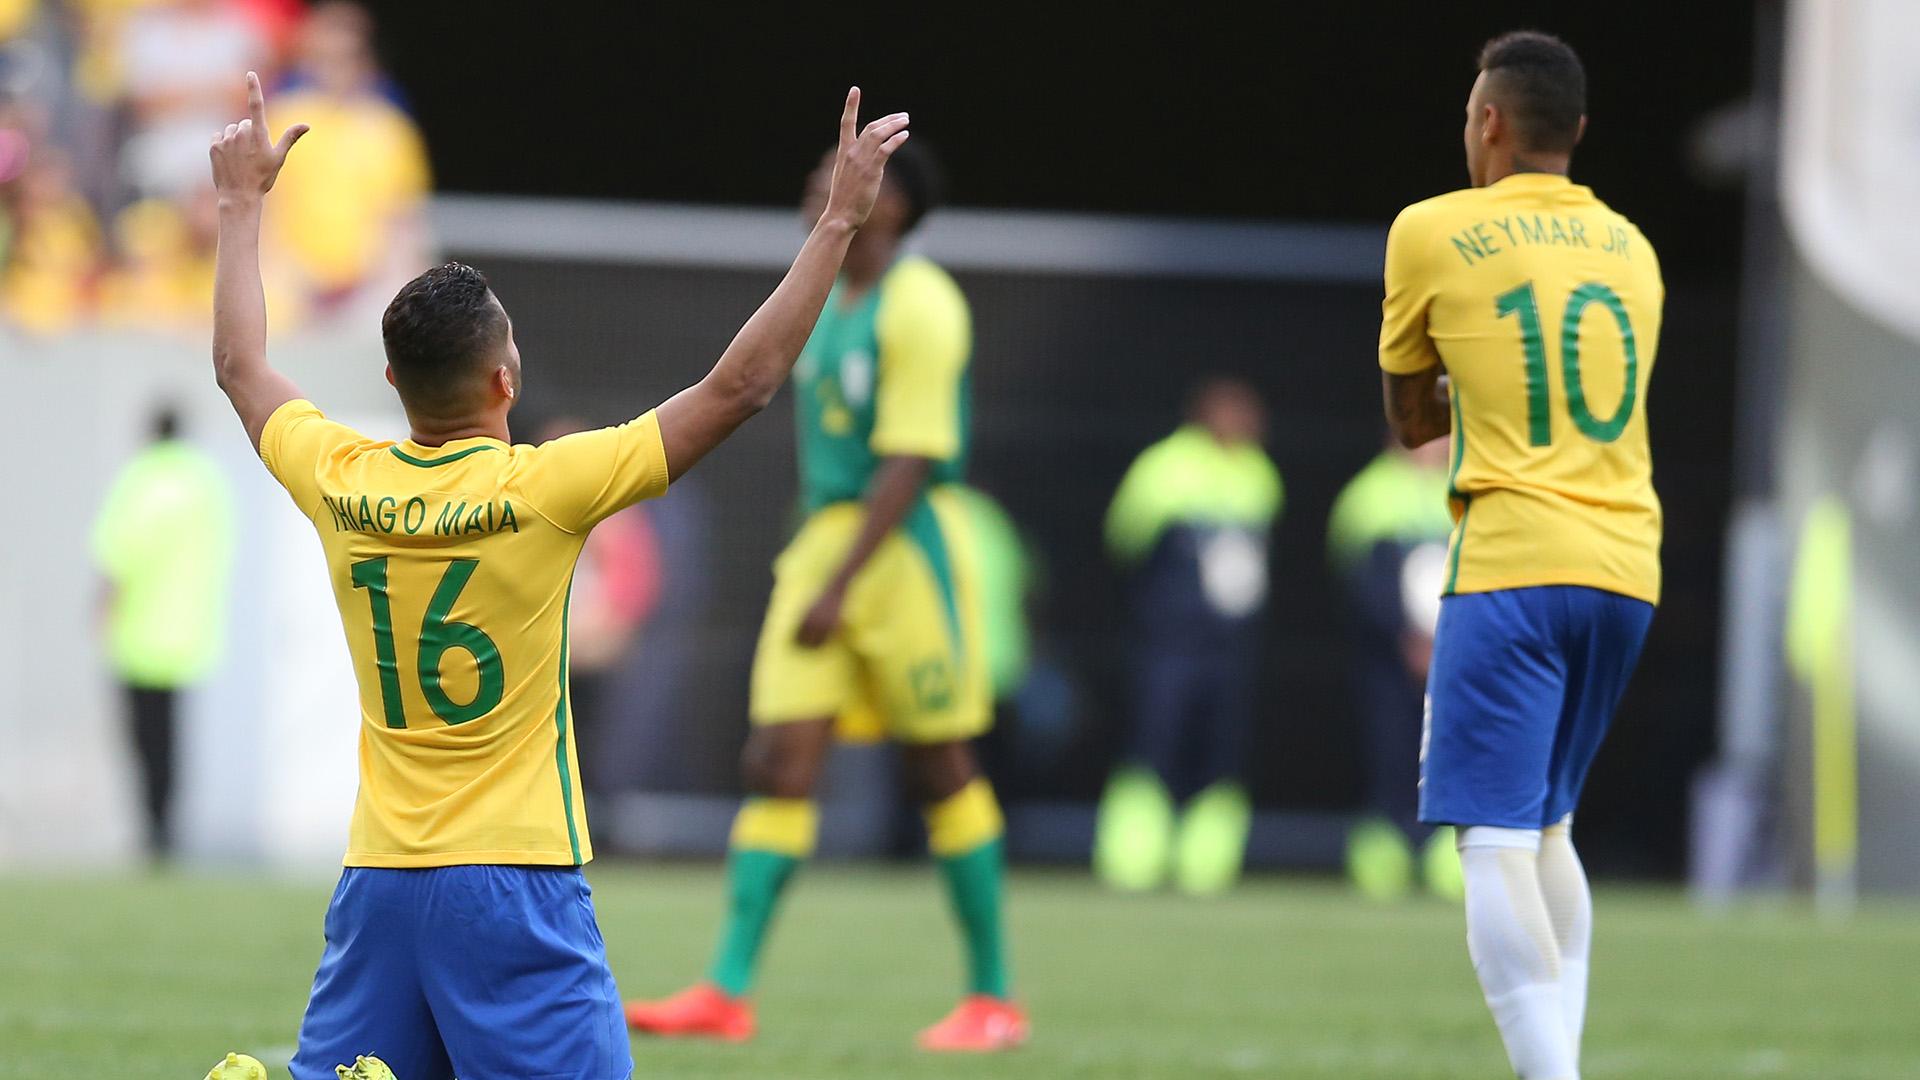 Thiago Maia Brazil South Africa Rio 2016 Olympics 04082016